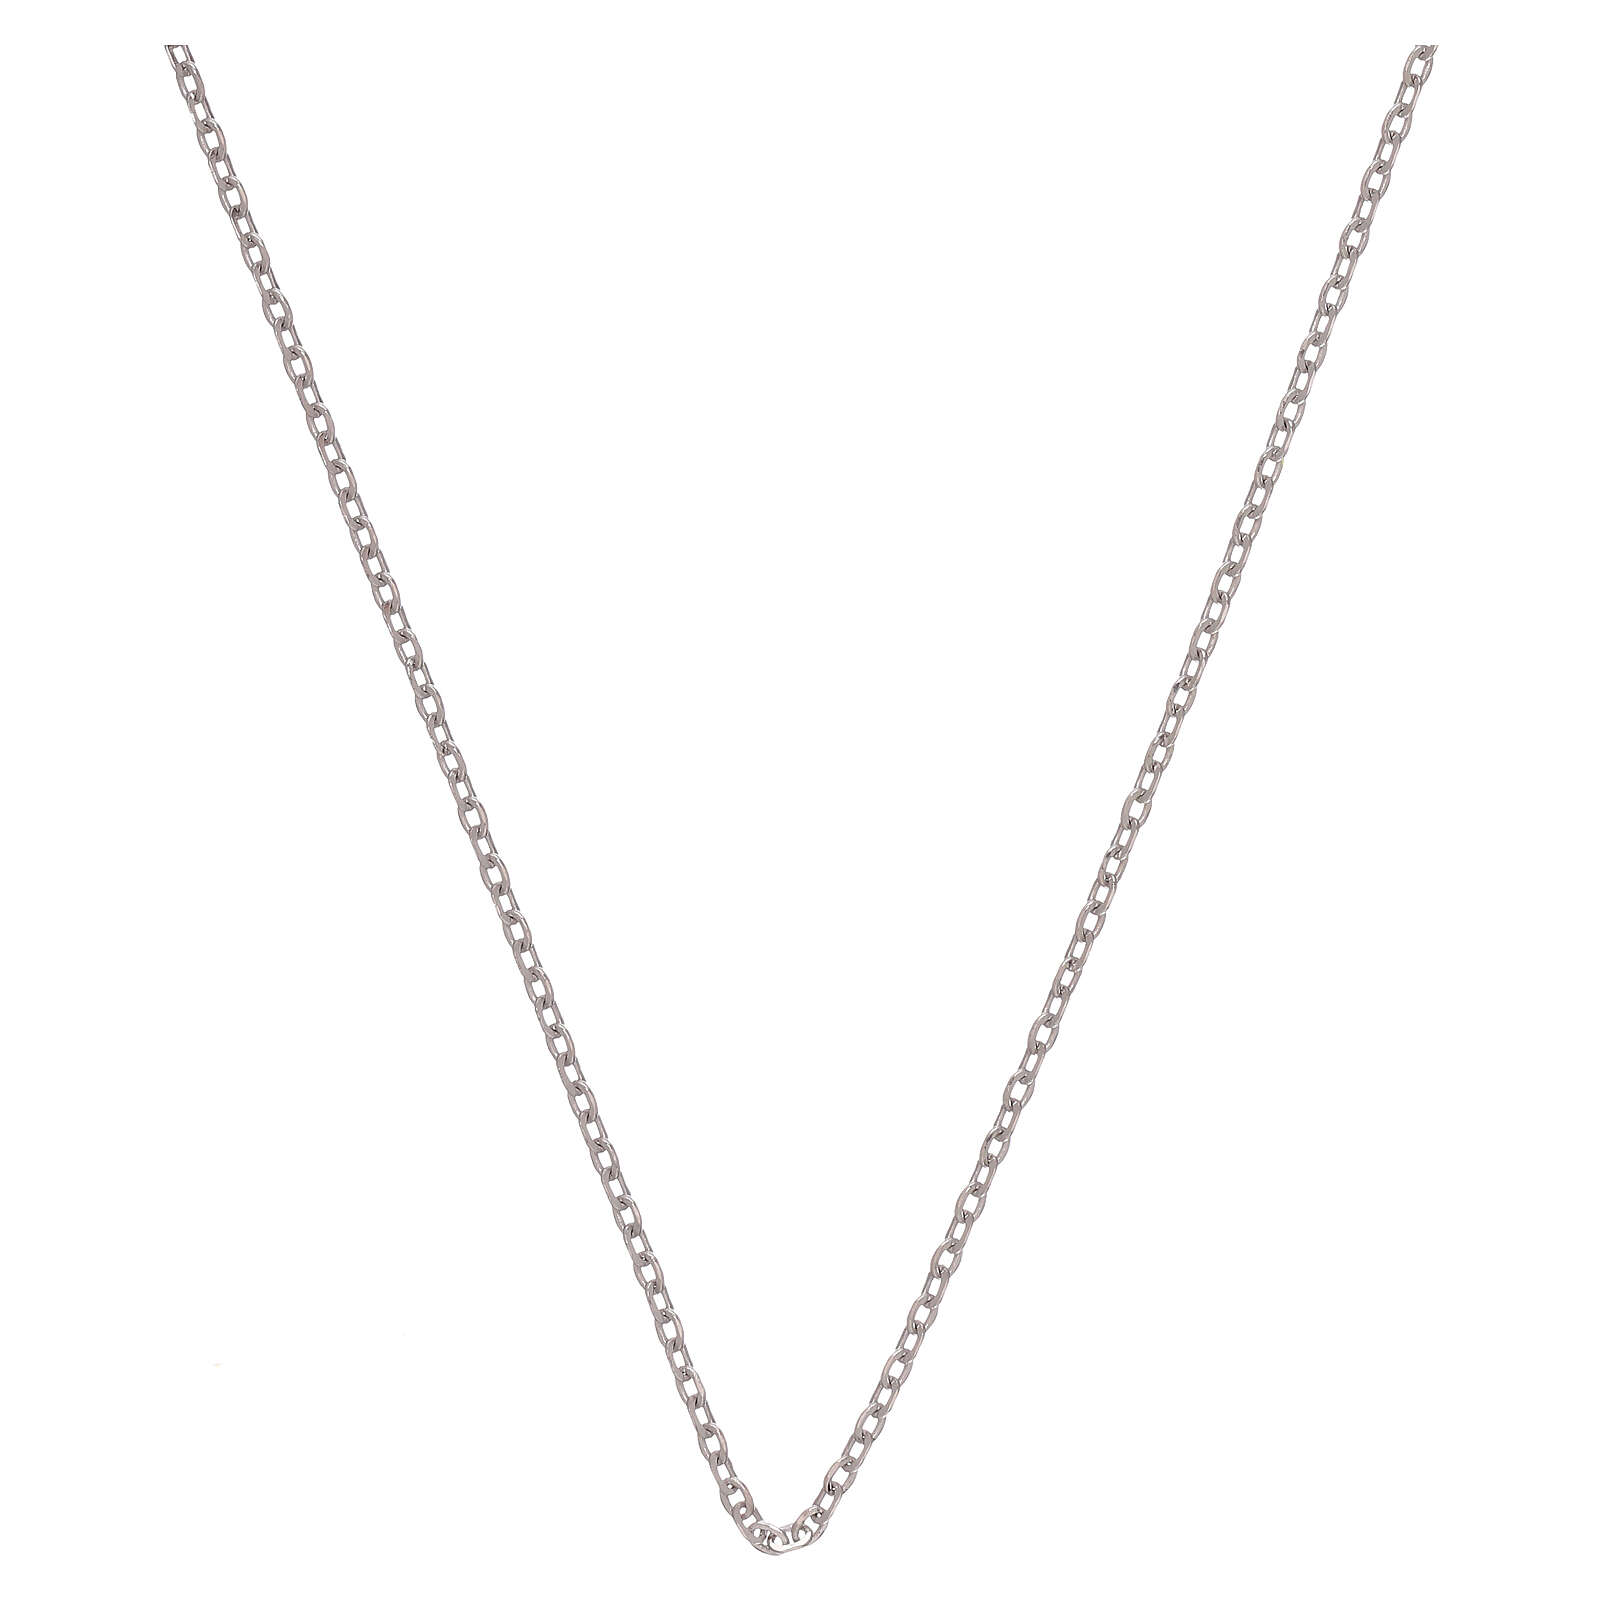 Corrente tipo Cartier ouro branco 18K diamantada 42 cm 4